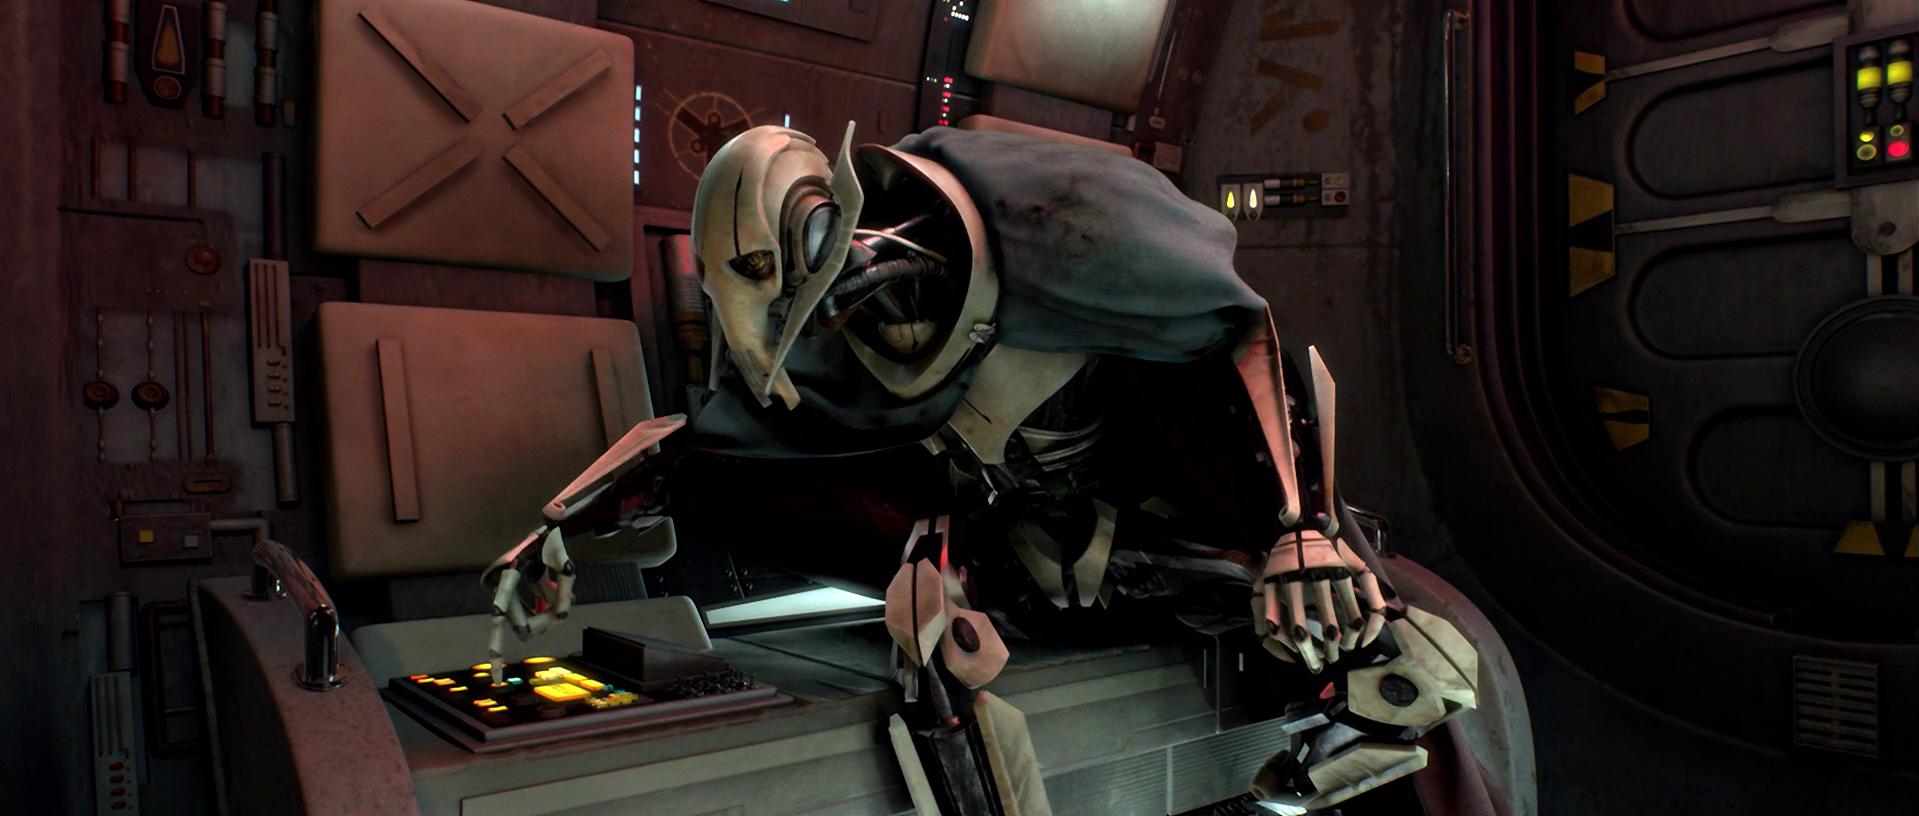 General Grievous Wookieepedia The Star Wars Wiki   2016 Car Release Date